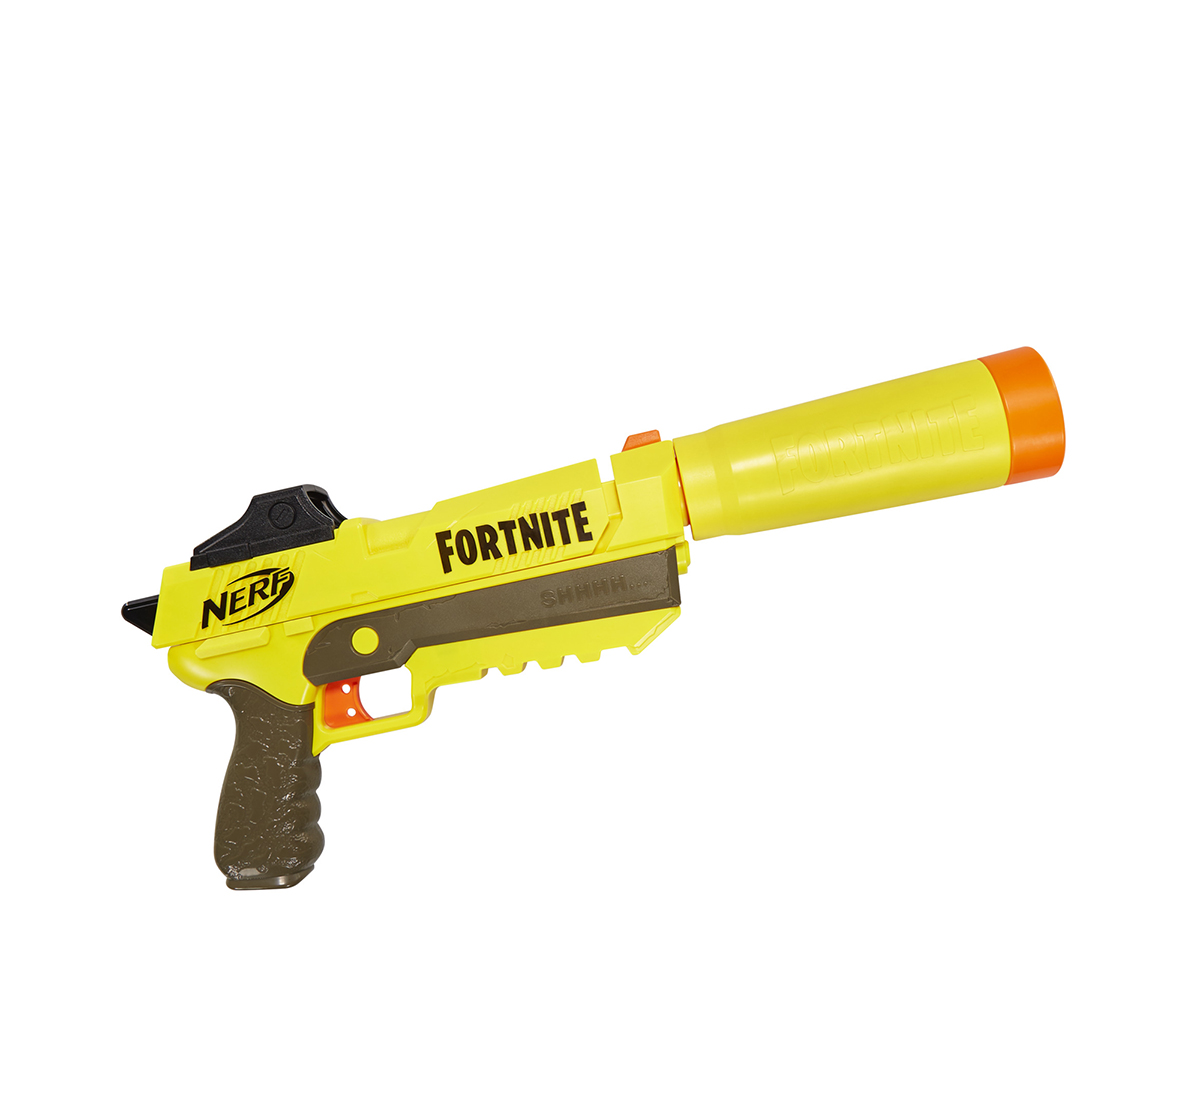 Nerf | Nerf Elite Fortnite Sp-L Dart Blasters for Kids age 8Y+